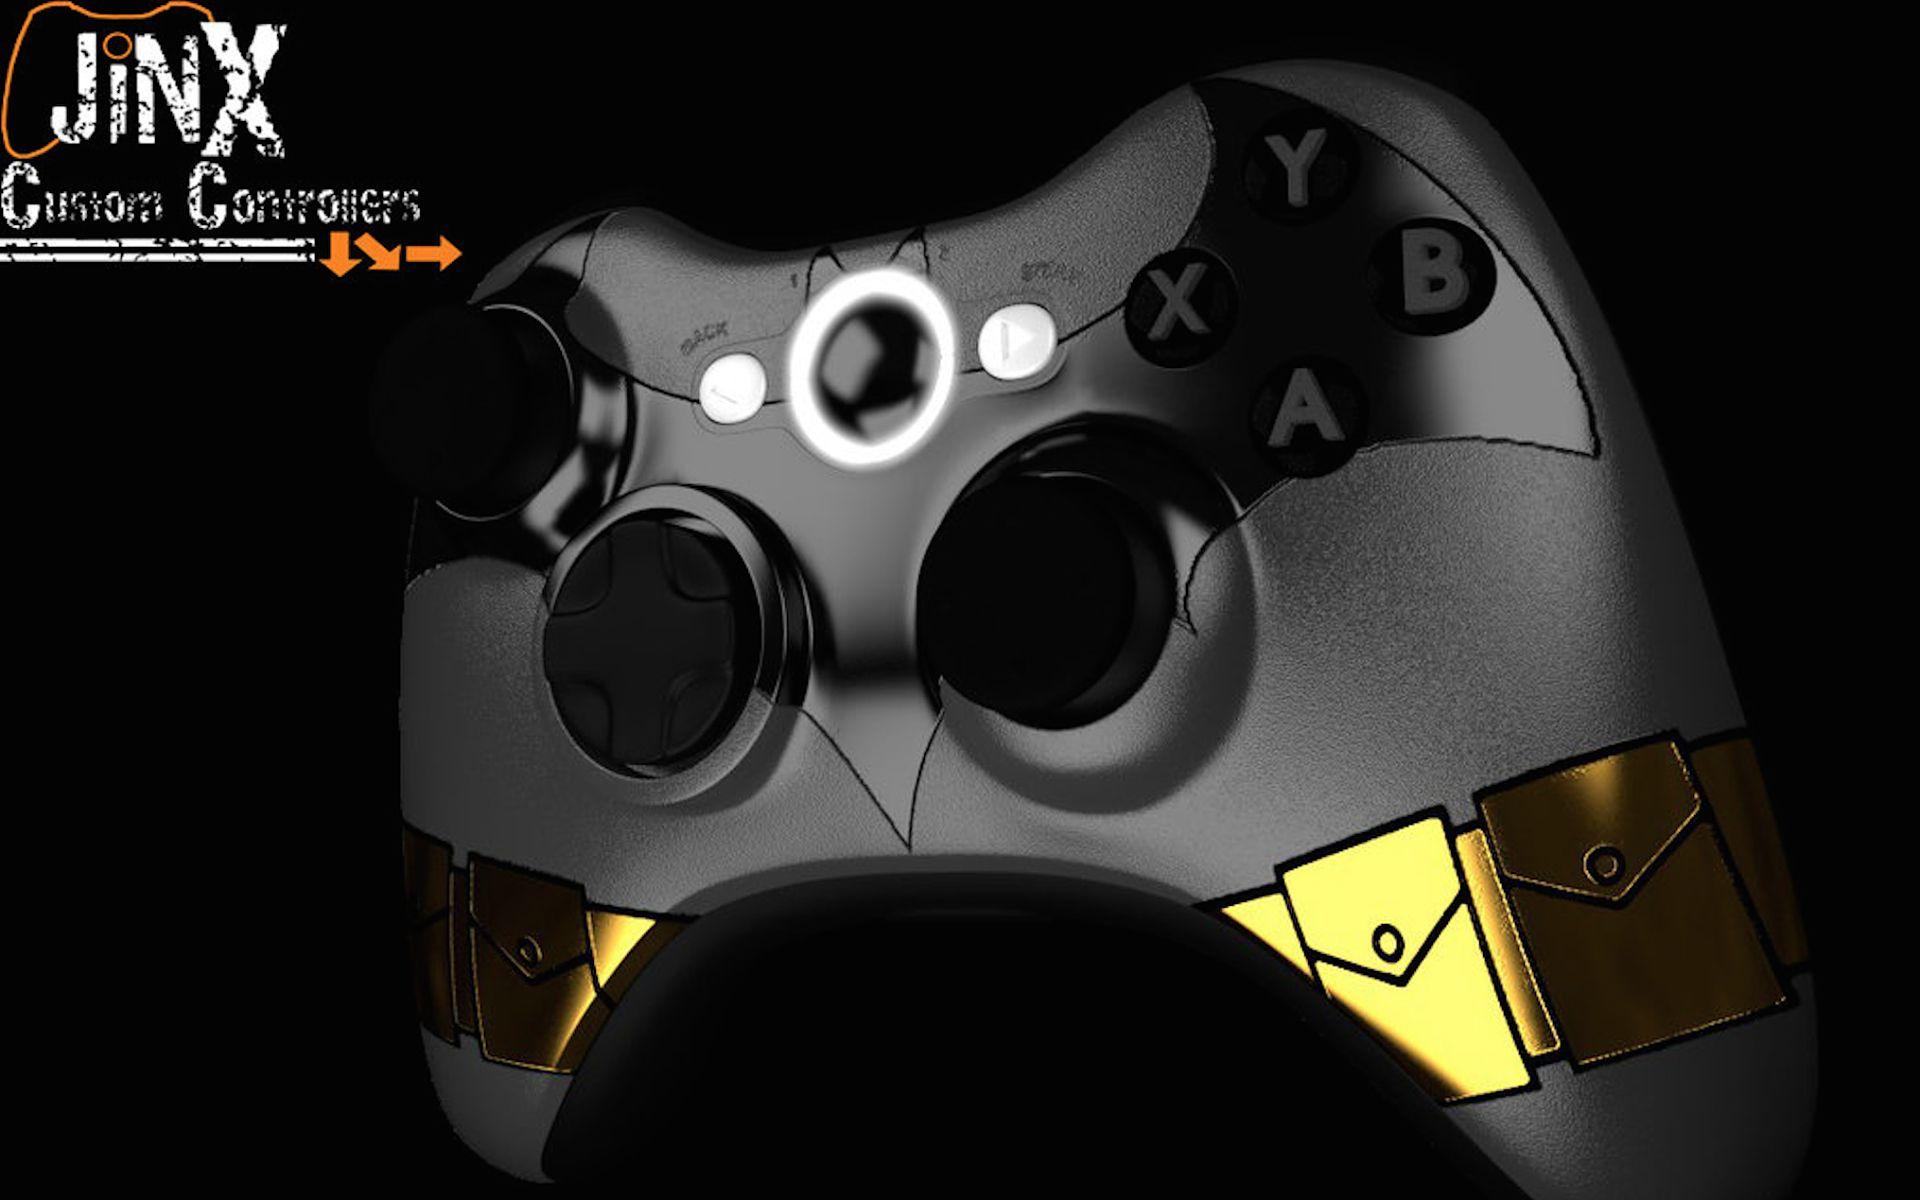 Batman Custom Xbox Controller 3d Game Wallpaper Custom Xbox Xbox Controller Xbox